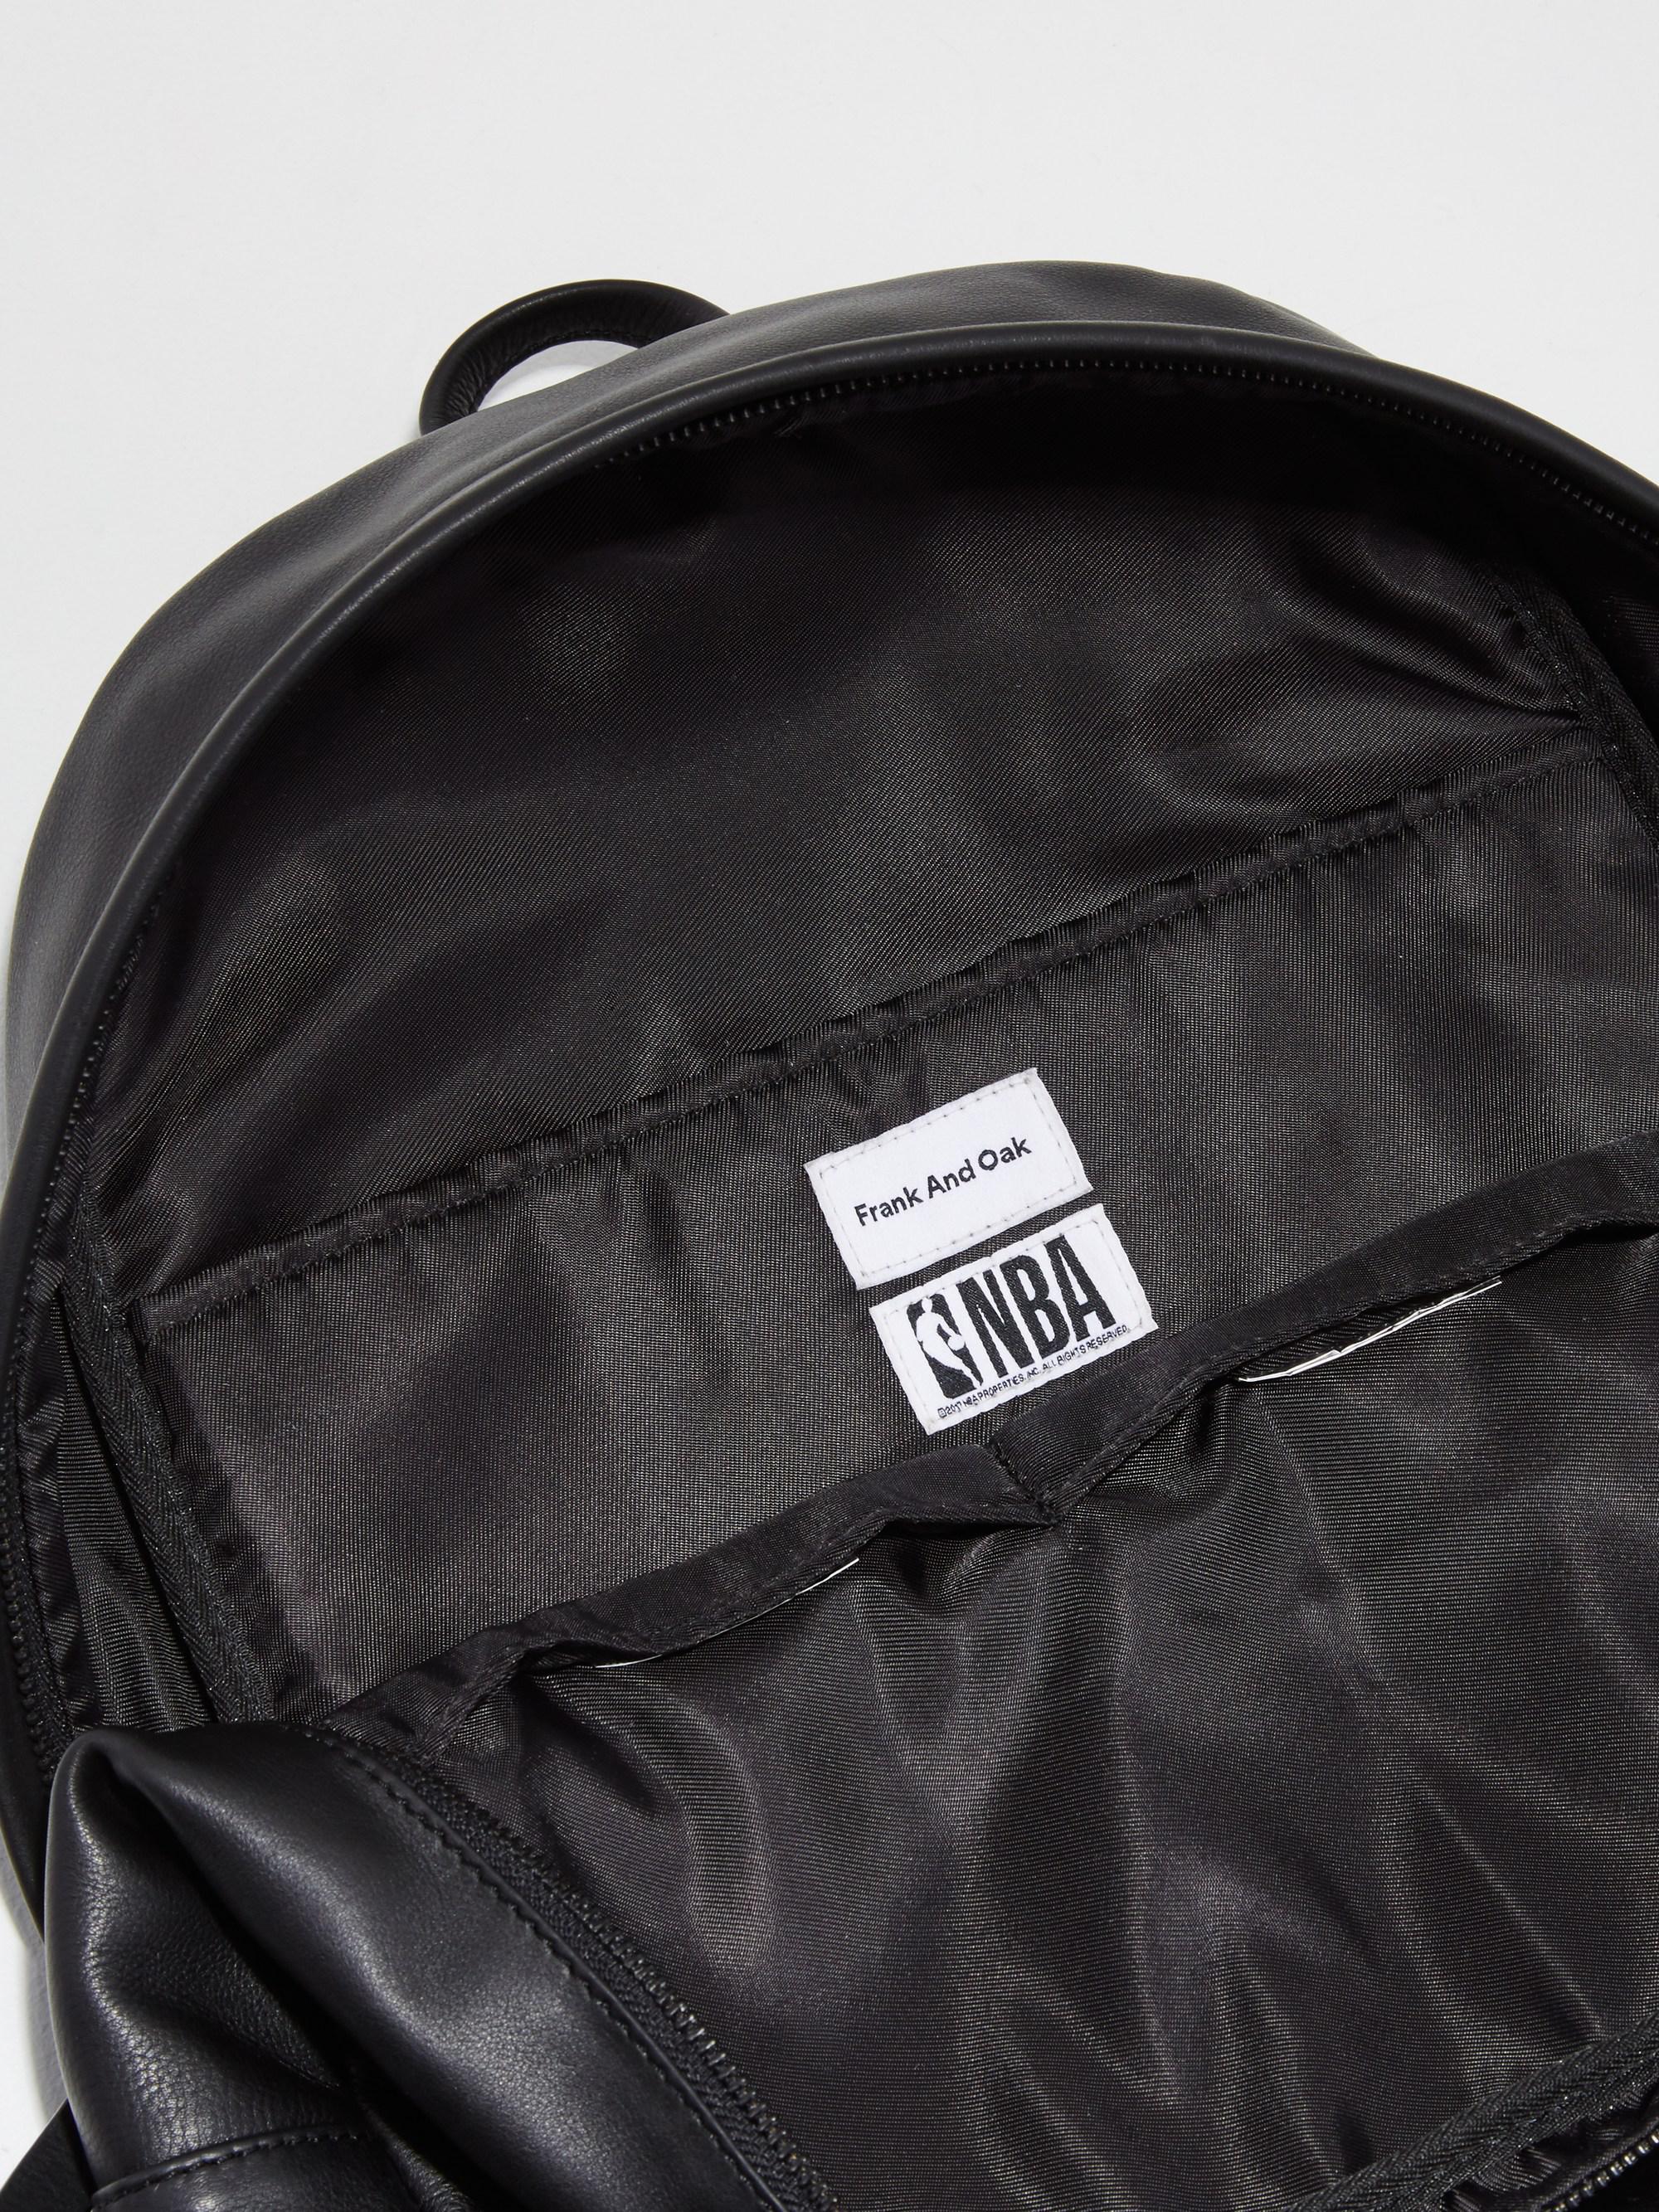 4670a1721b6e New Look Perspex Mesh Backpack- Fenix Toulouse Handball